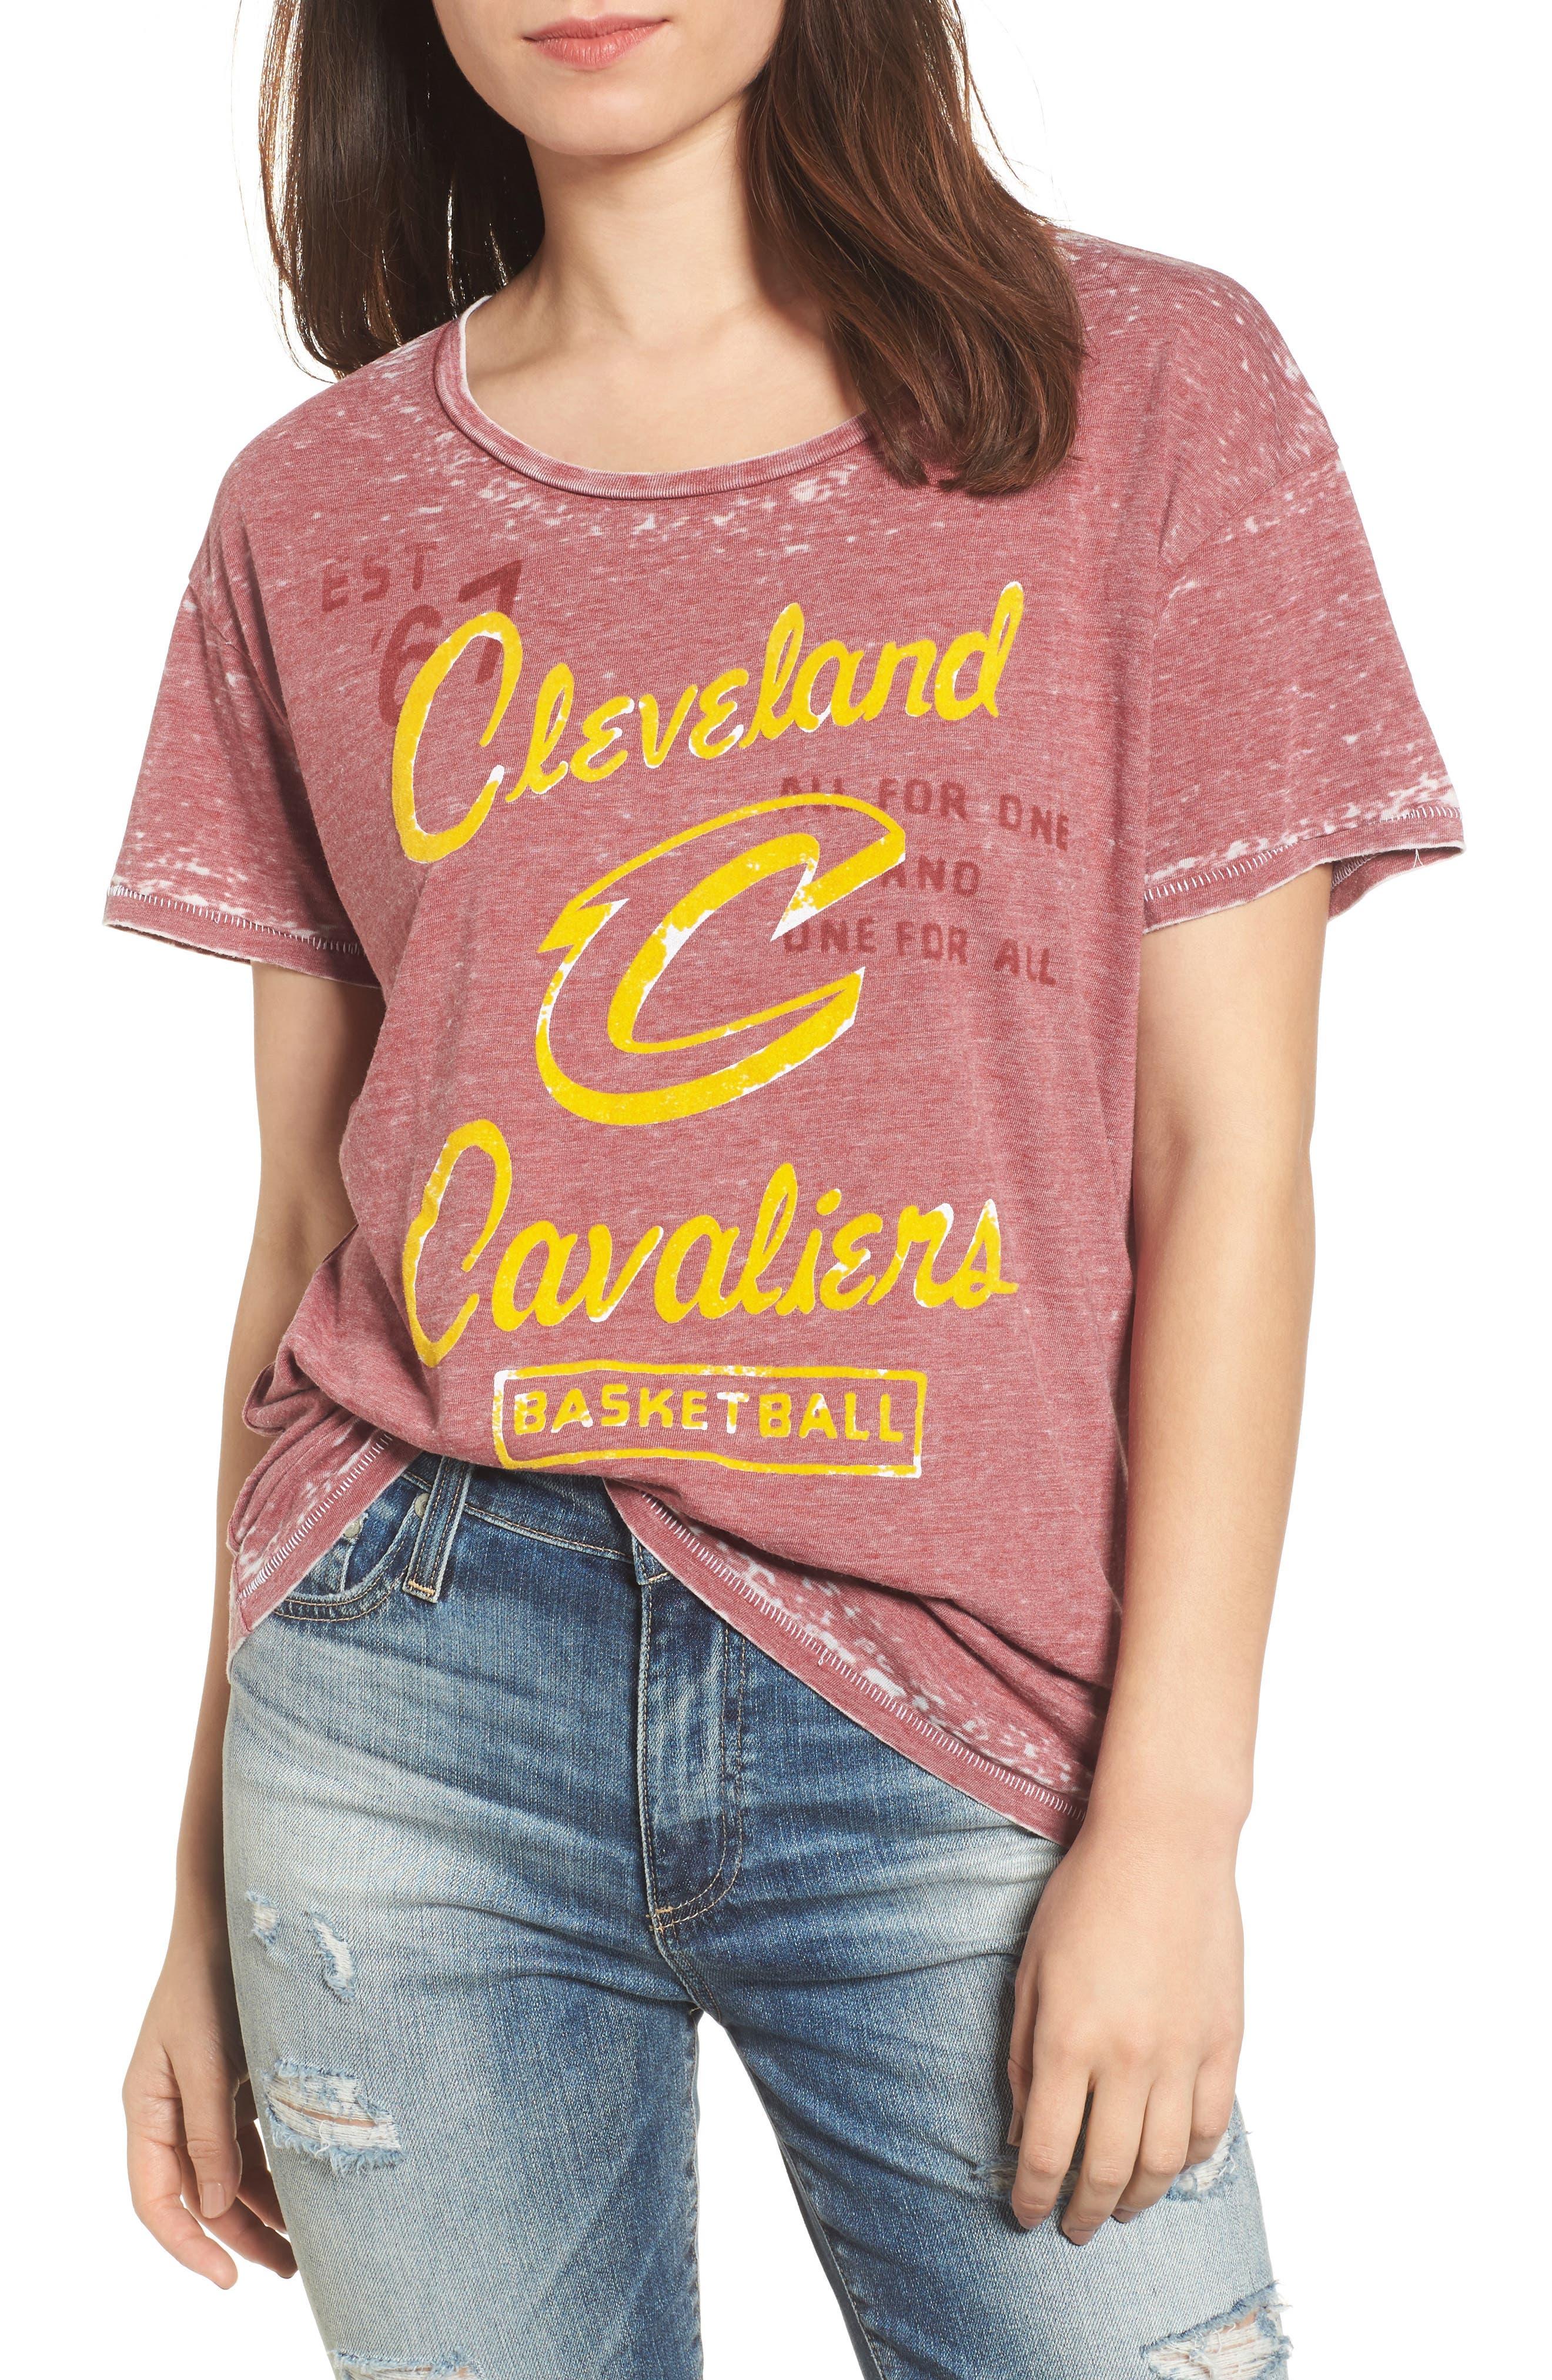 NBA Cleveland Cavaliers Tee,                             Main thumbnail 1, color,                             933